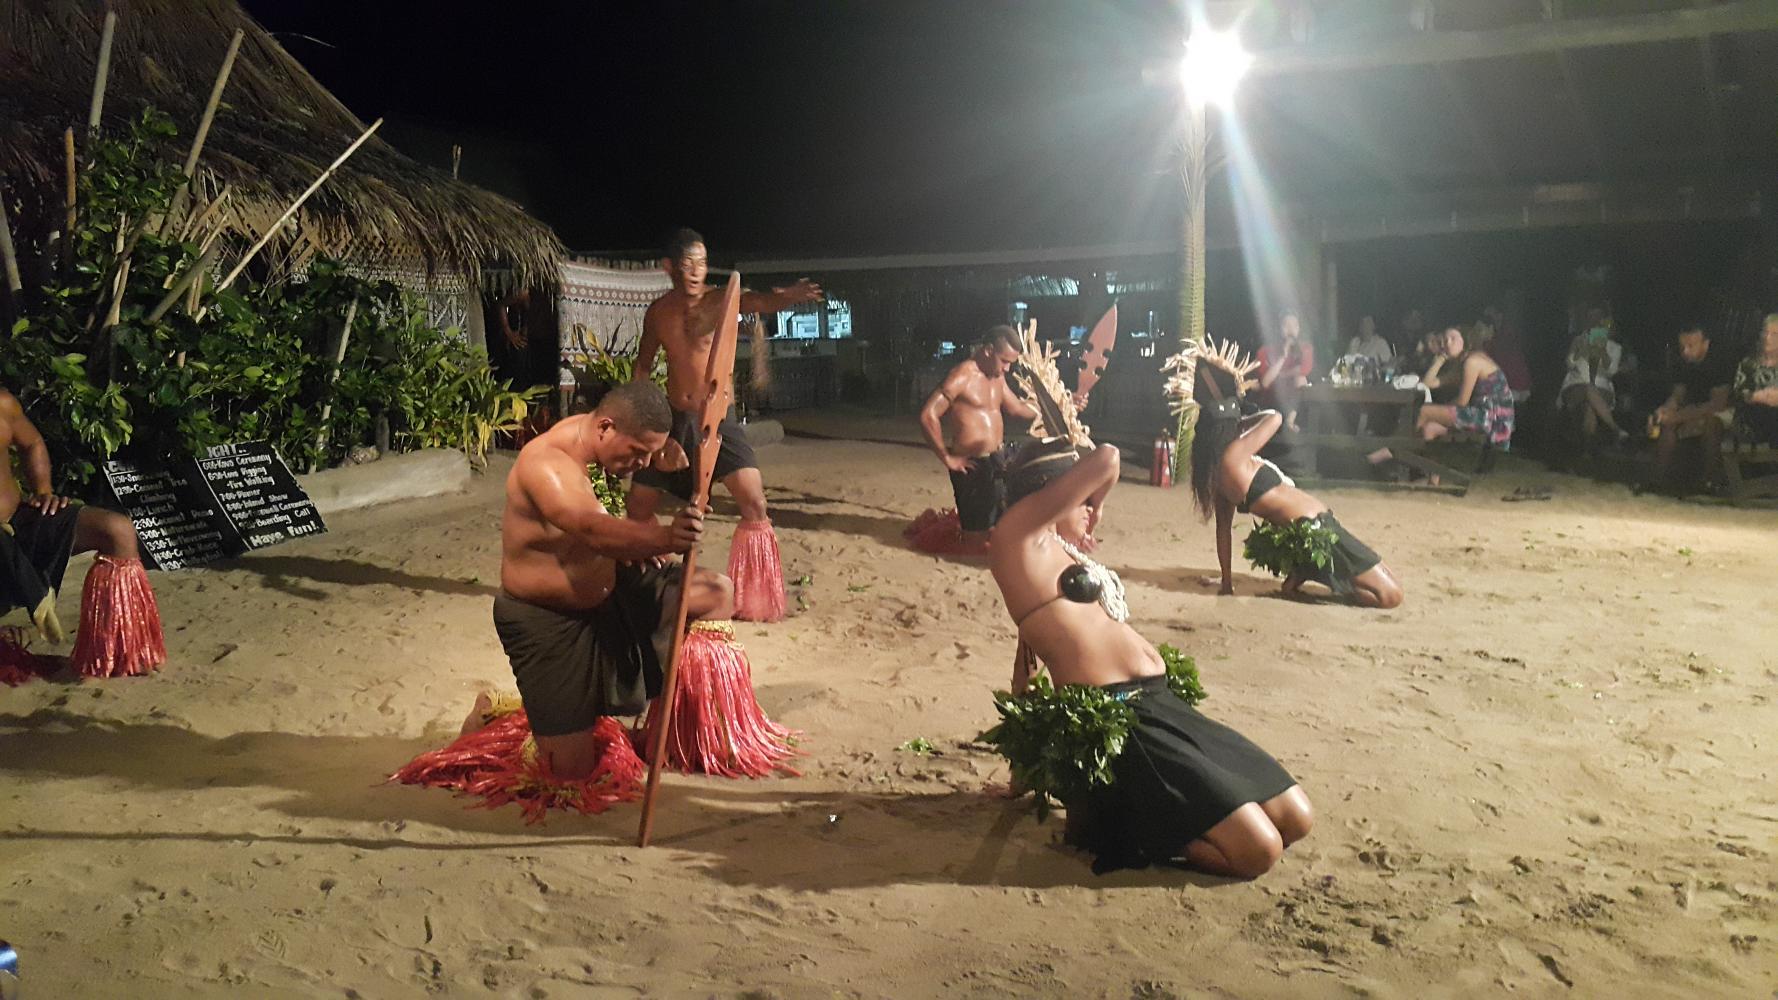 Robinson Crusoe Island Fijian Dance Show & Lovo Dinner tour in Fiji